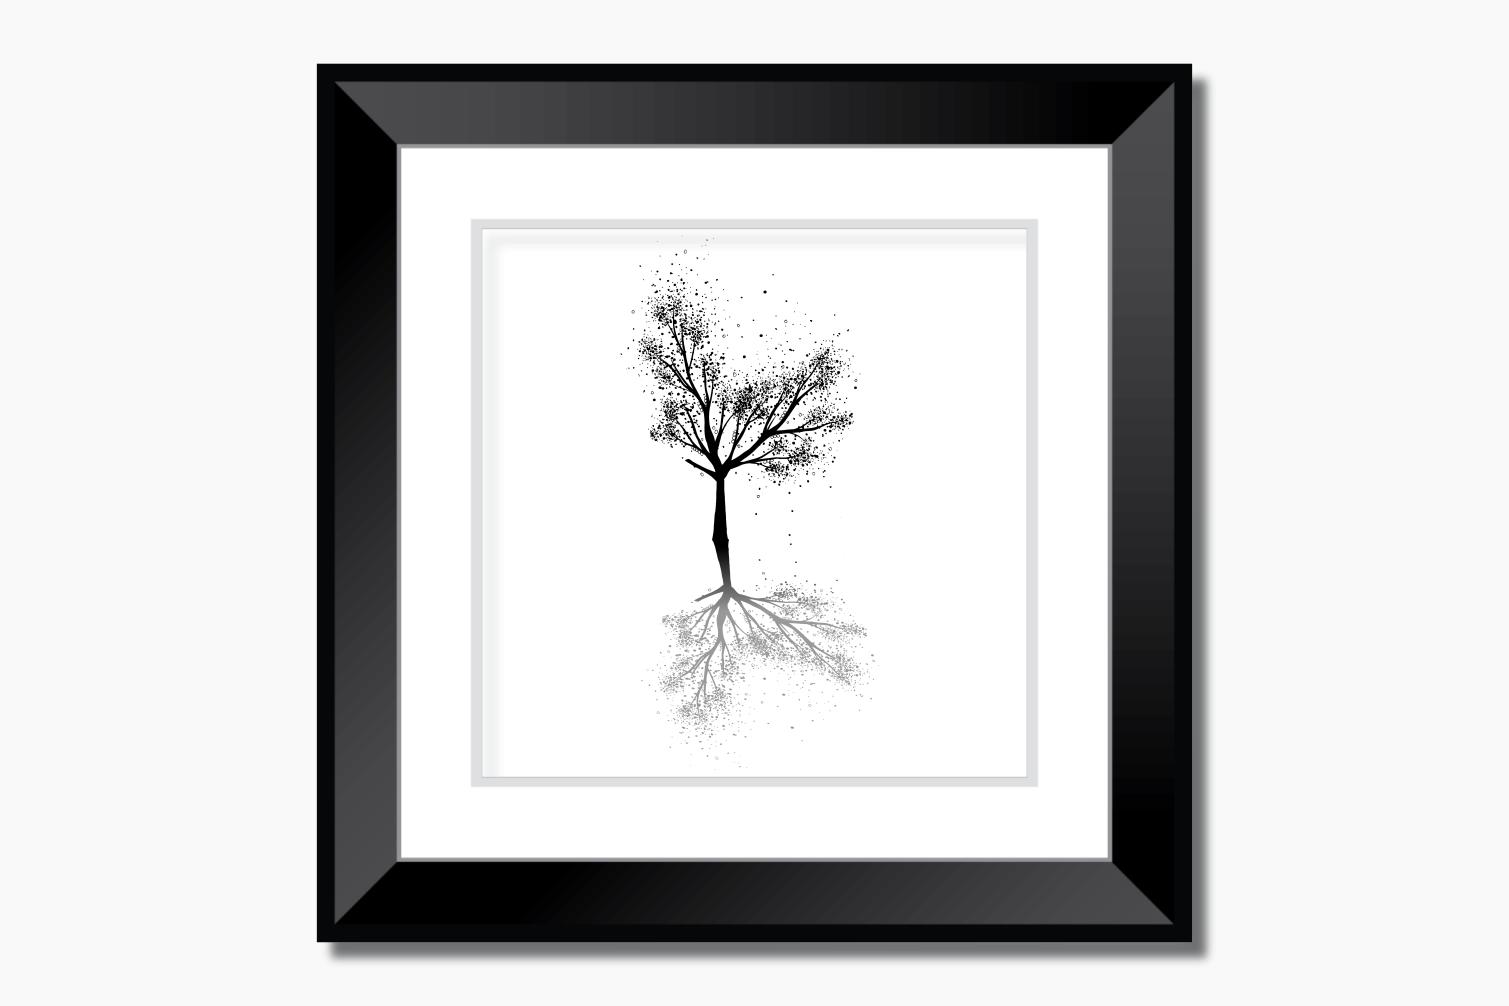 Black Tree Ink Art, A1, SVG example image 9